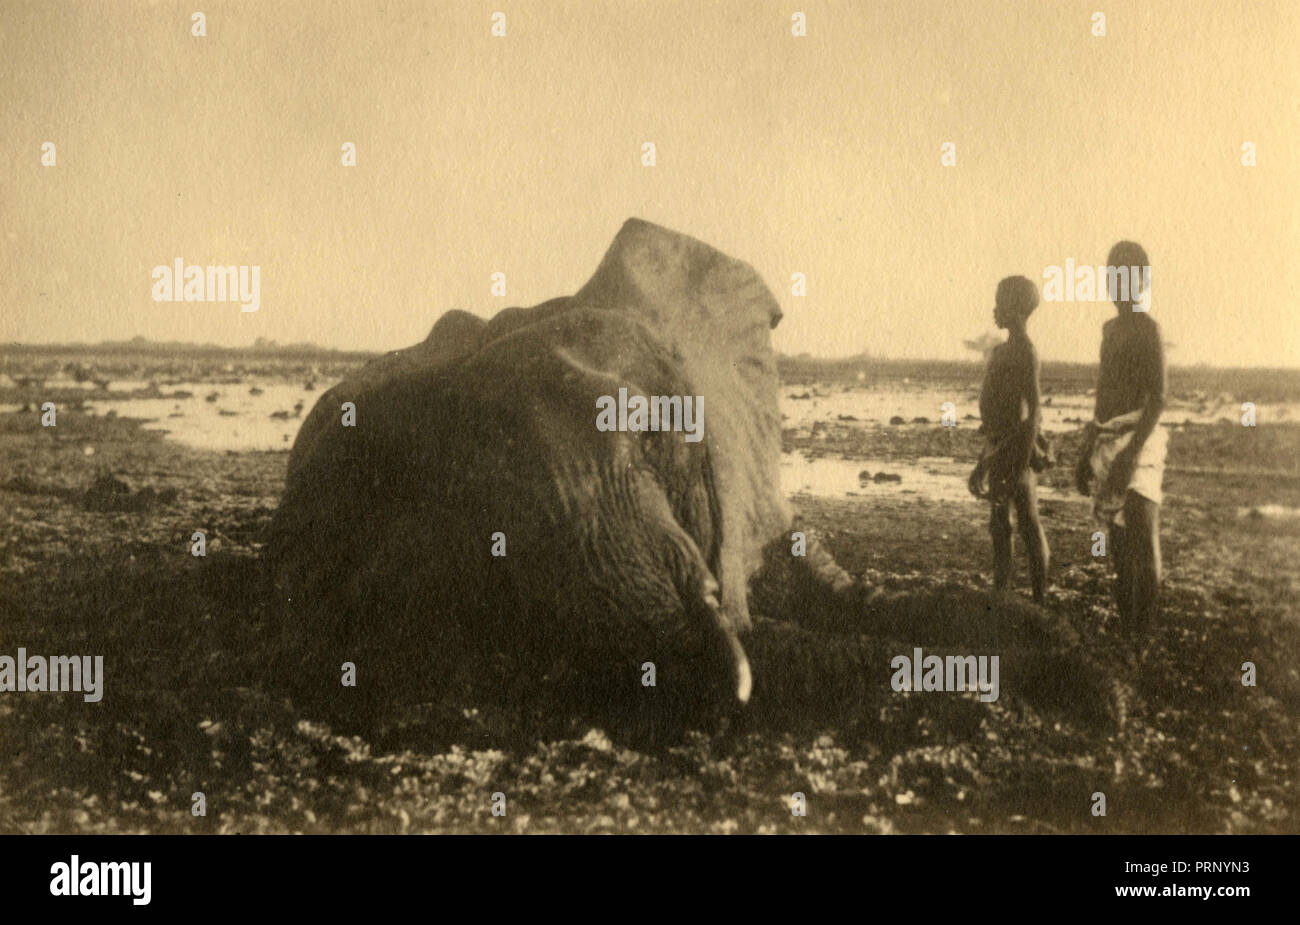 A killed elephant, Gelito 1933 - Stock Image